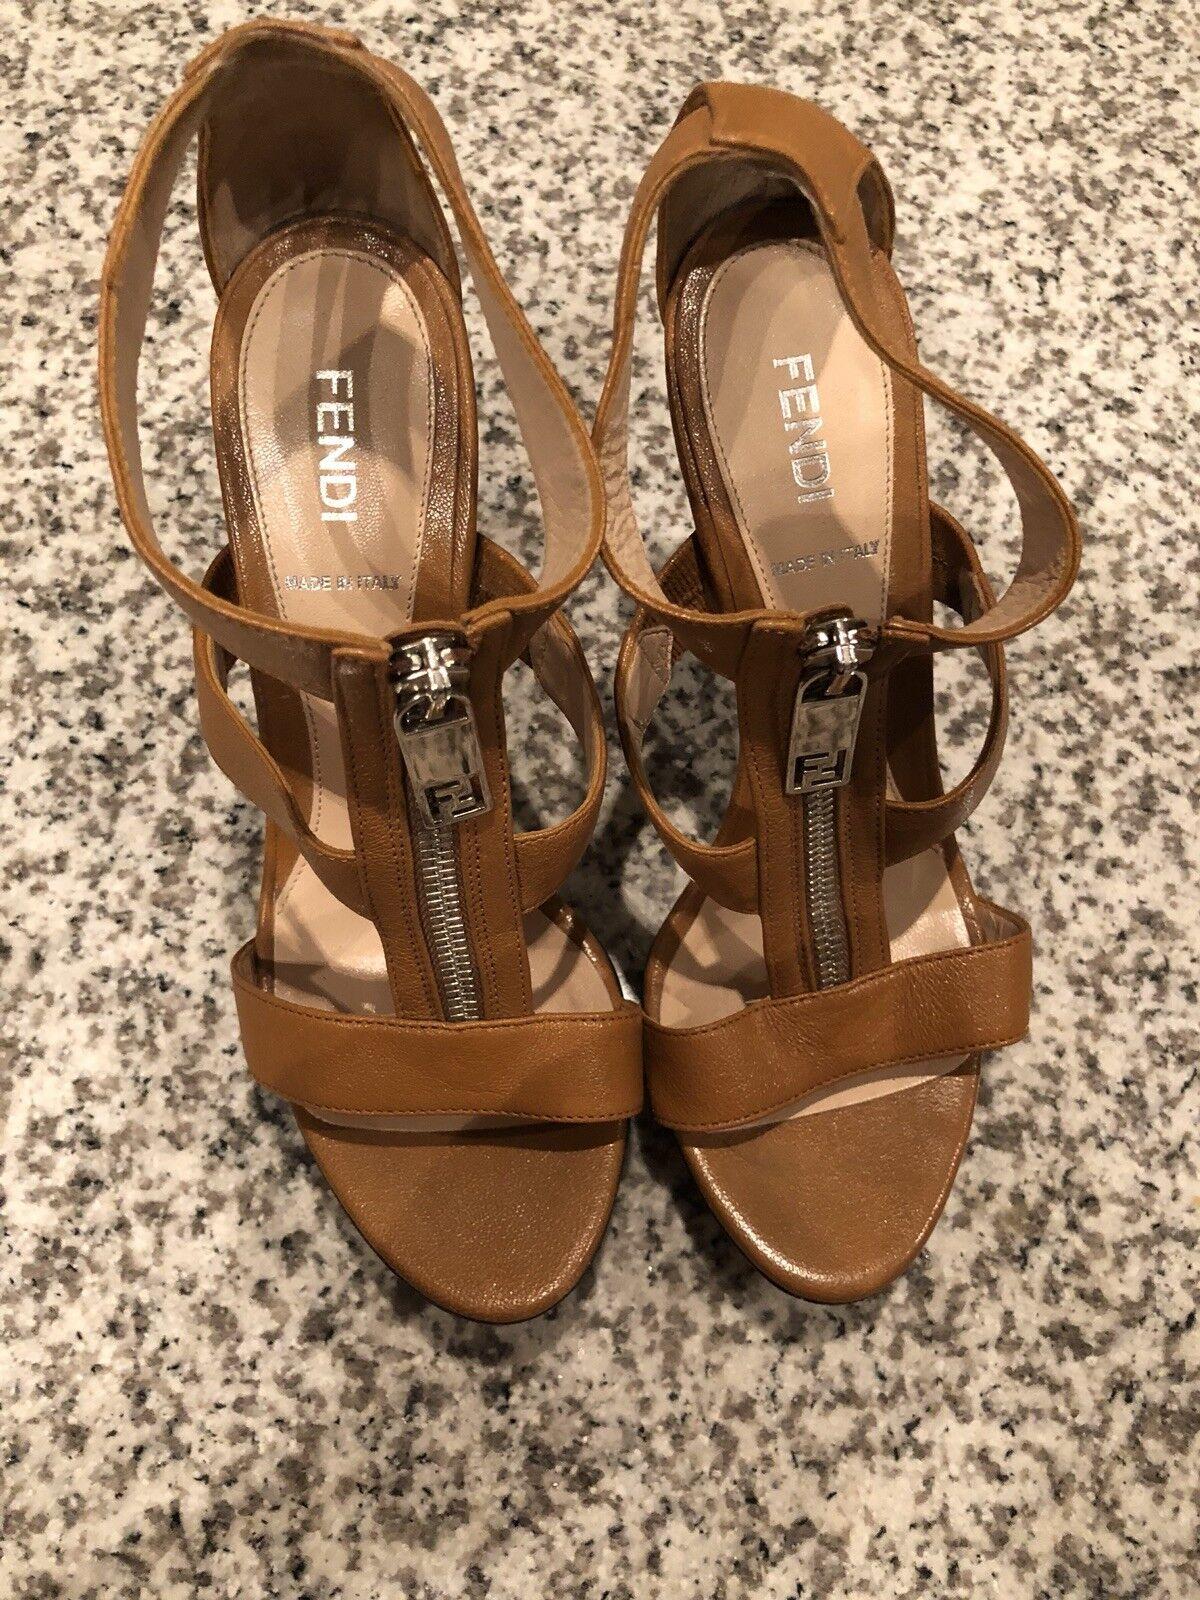 FENDI Zip Gladiator Tan Leather Platform Slingback Slingback Slingback Sandals démarrageies chaussures 36.5 7b02df